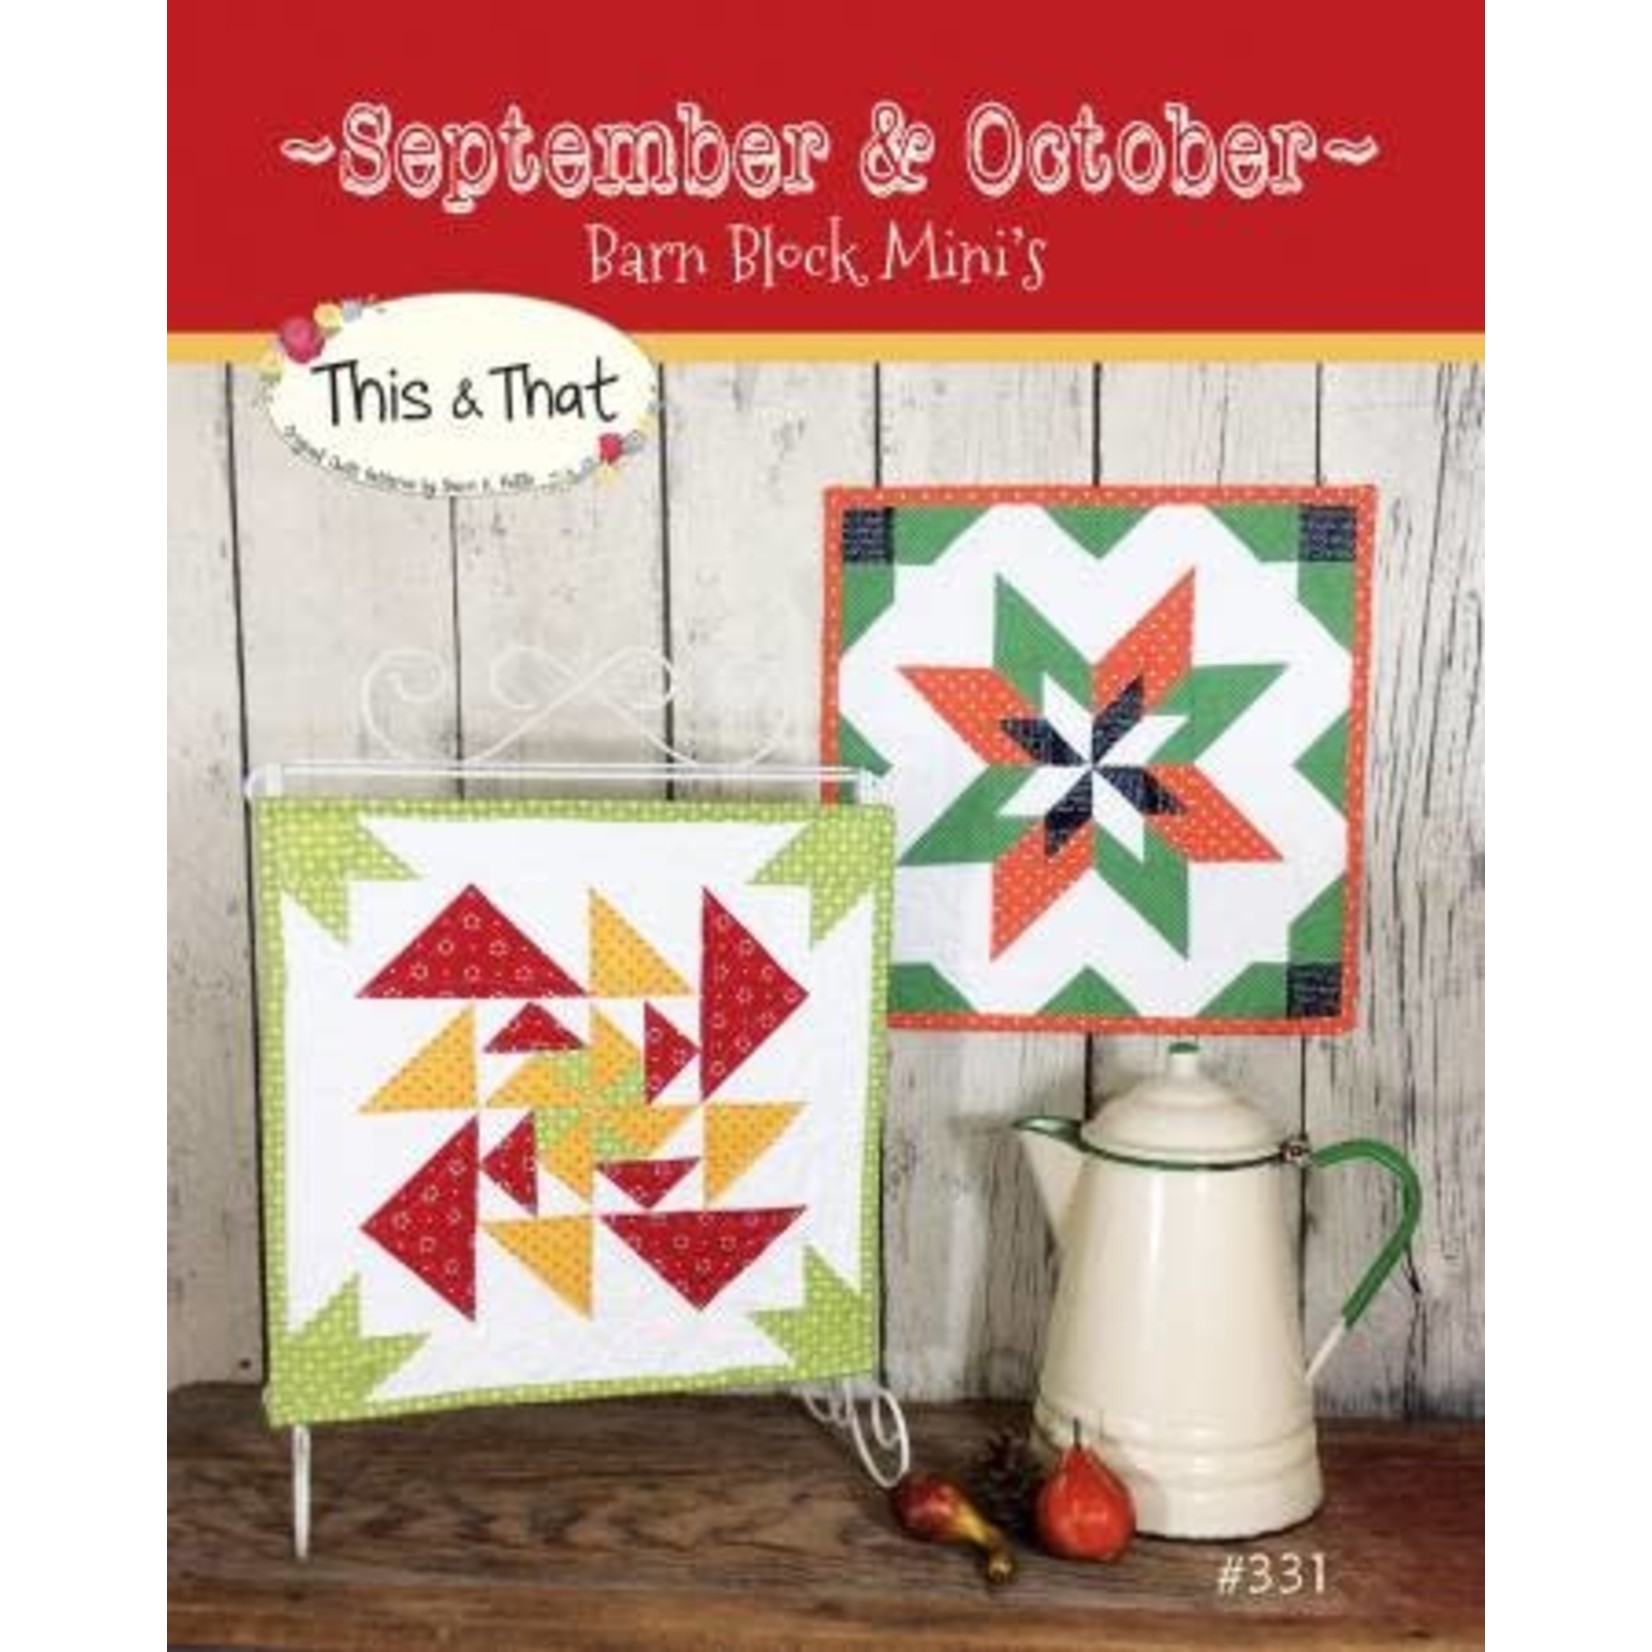 Barn Block Mini's September & Ocober - Sherri K. Falls